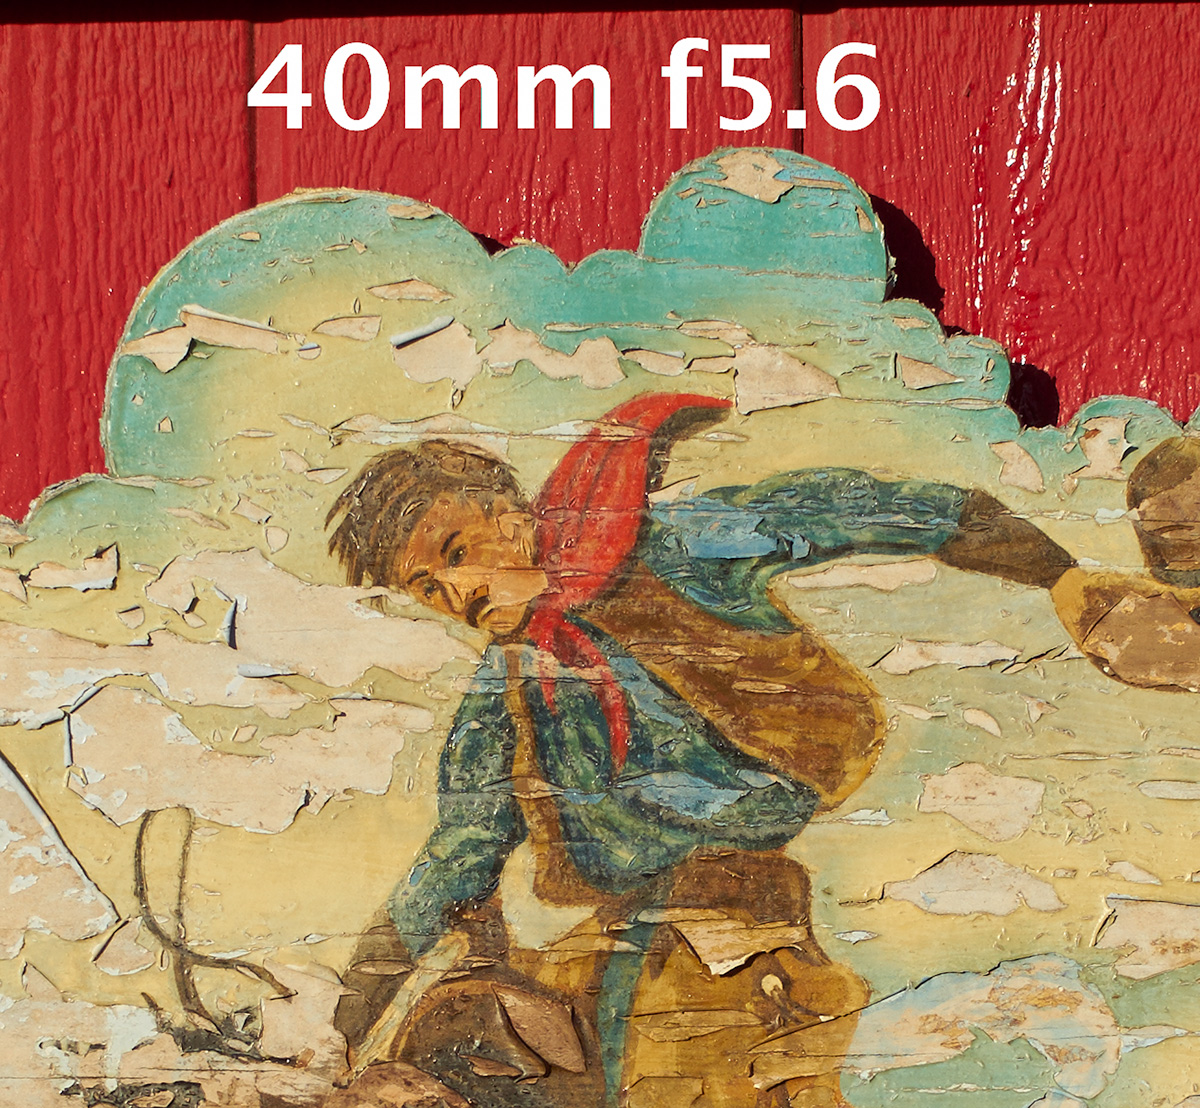 40mm56 by Guy Mancuso in Guy Mancuso